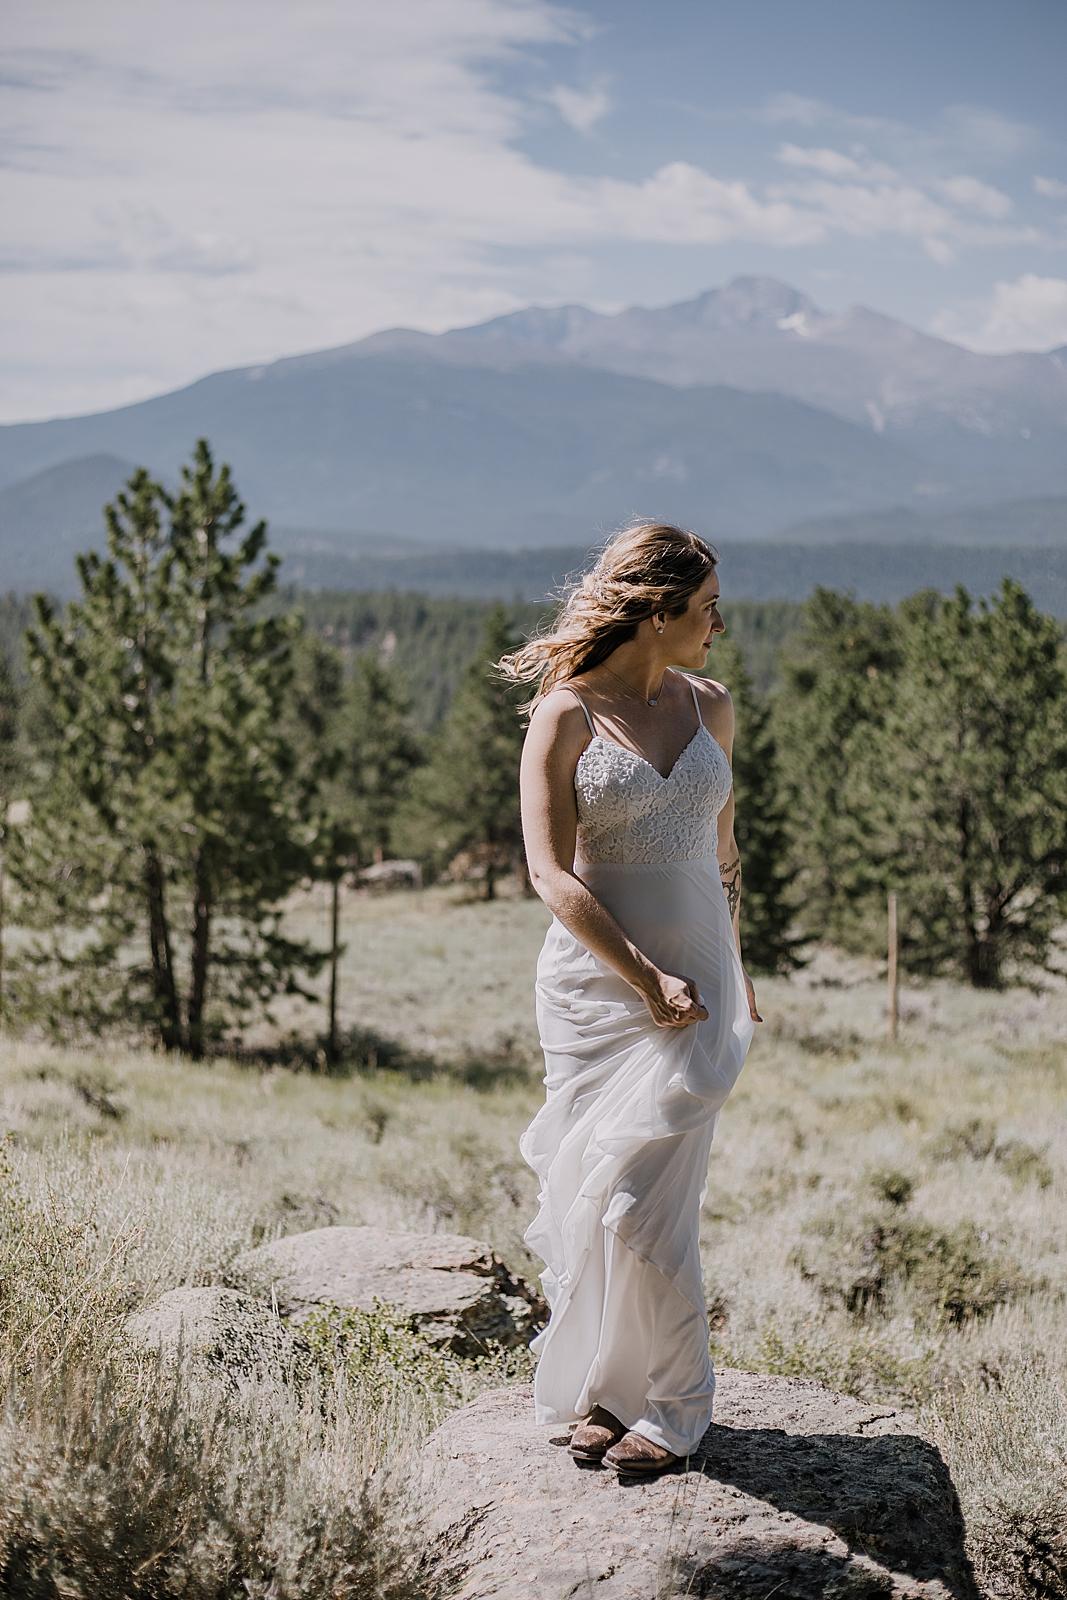 bride in wedding dress, RMNP elopement ceremony, rocky mountain national park elopement, 3M curves elopement, self solemnizing, self solemnization, long's peak, summer elopement, estes park elopement